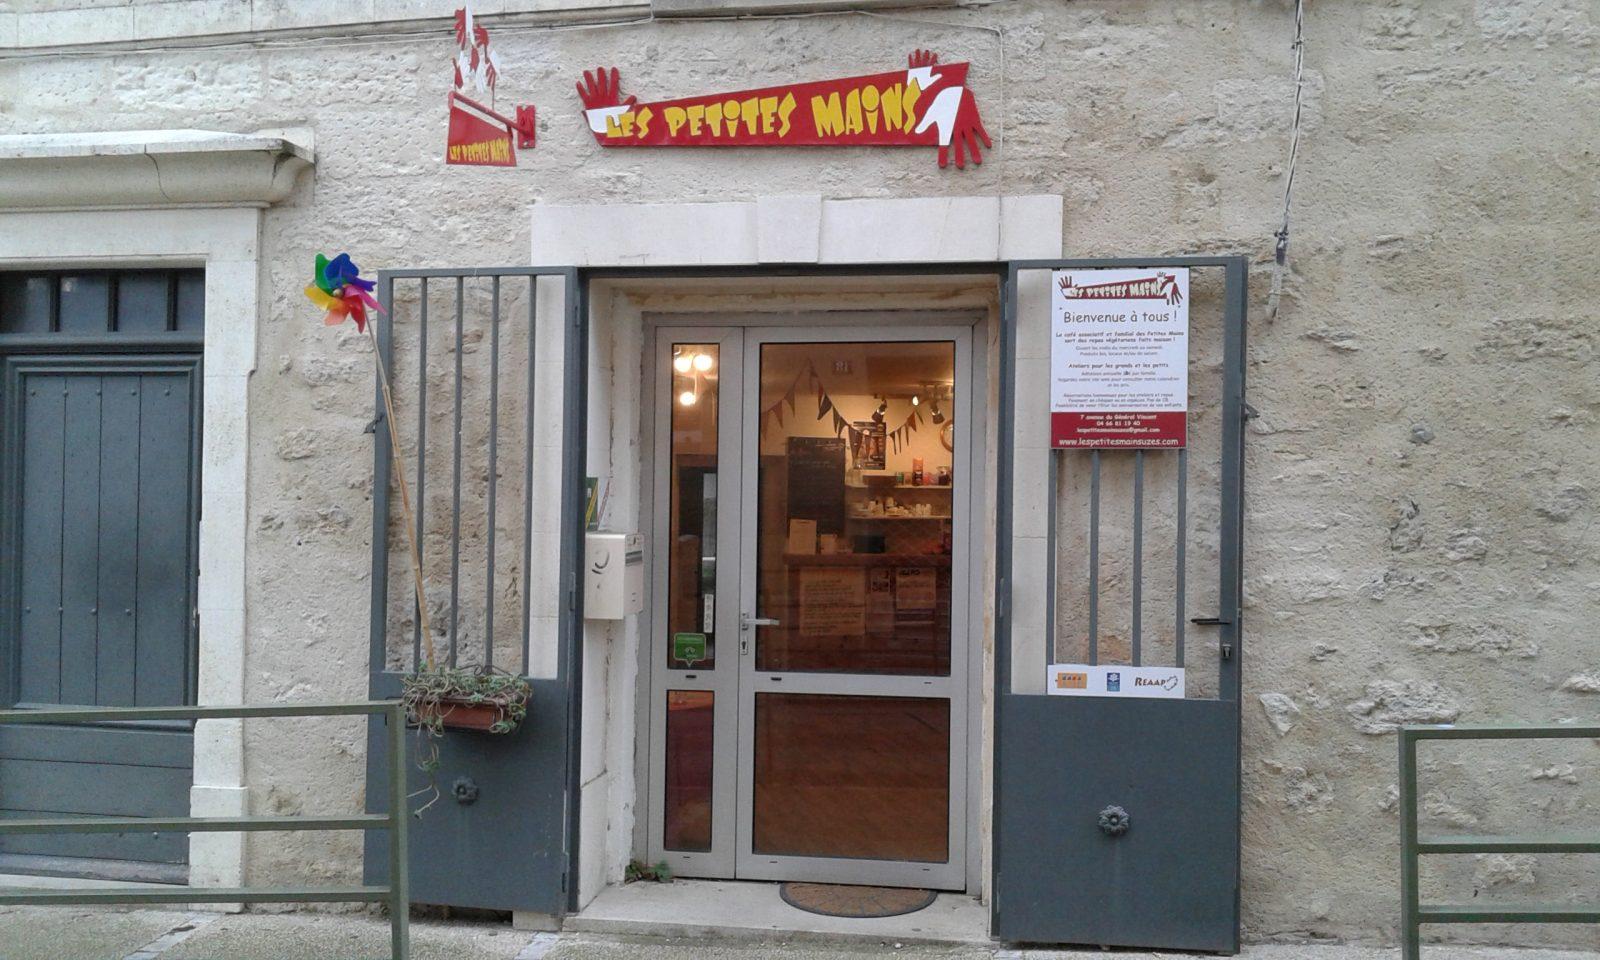 Restaurant Café associatif – Les Petites Mains